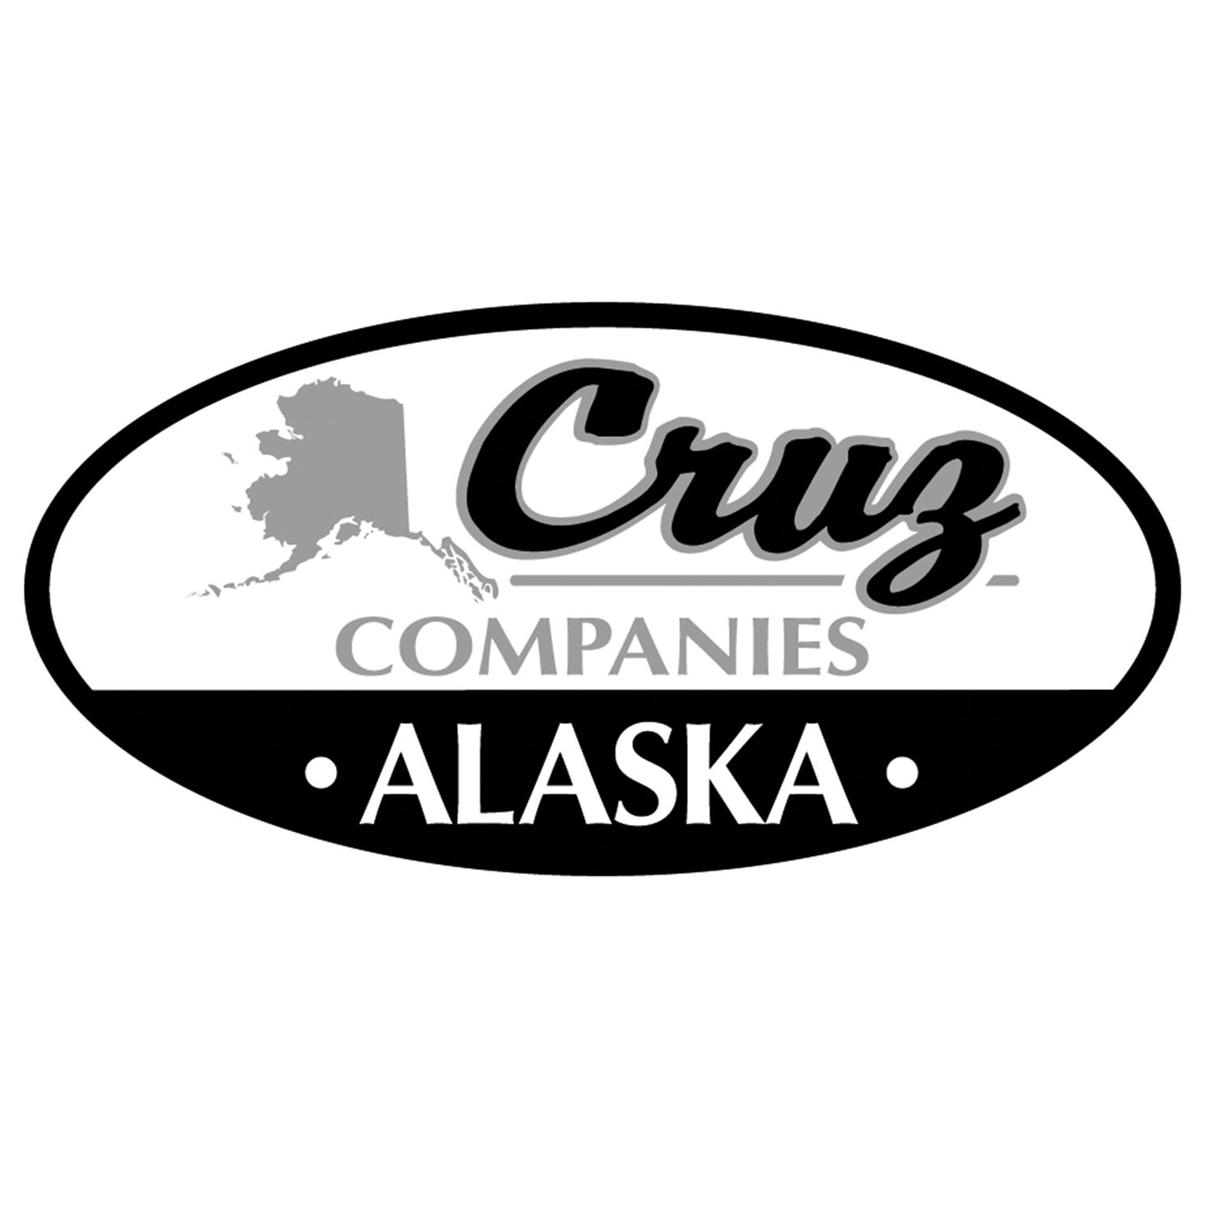 Cruz Companies